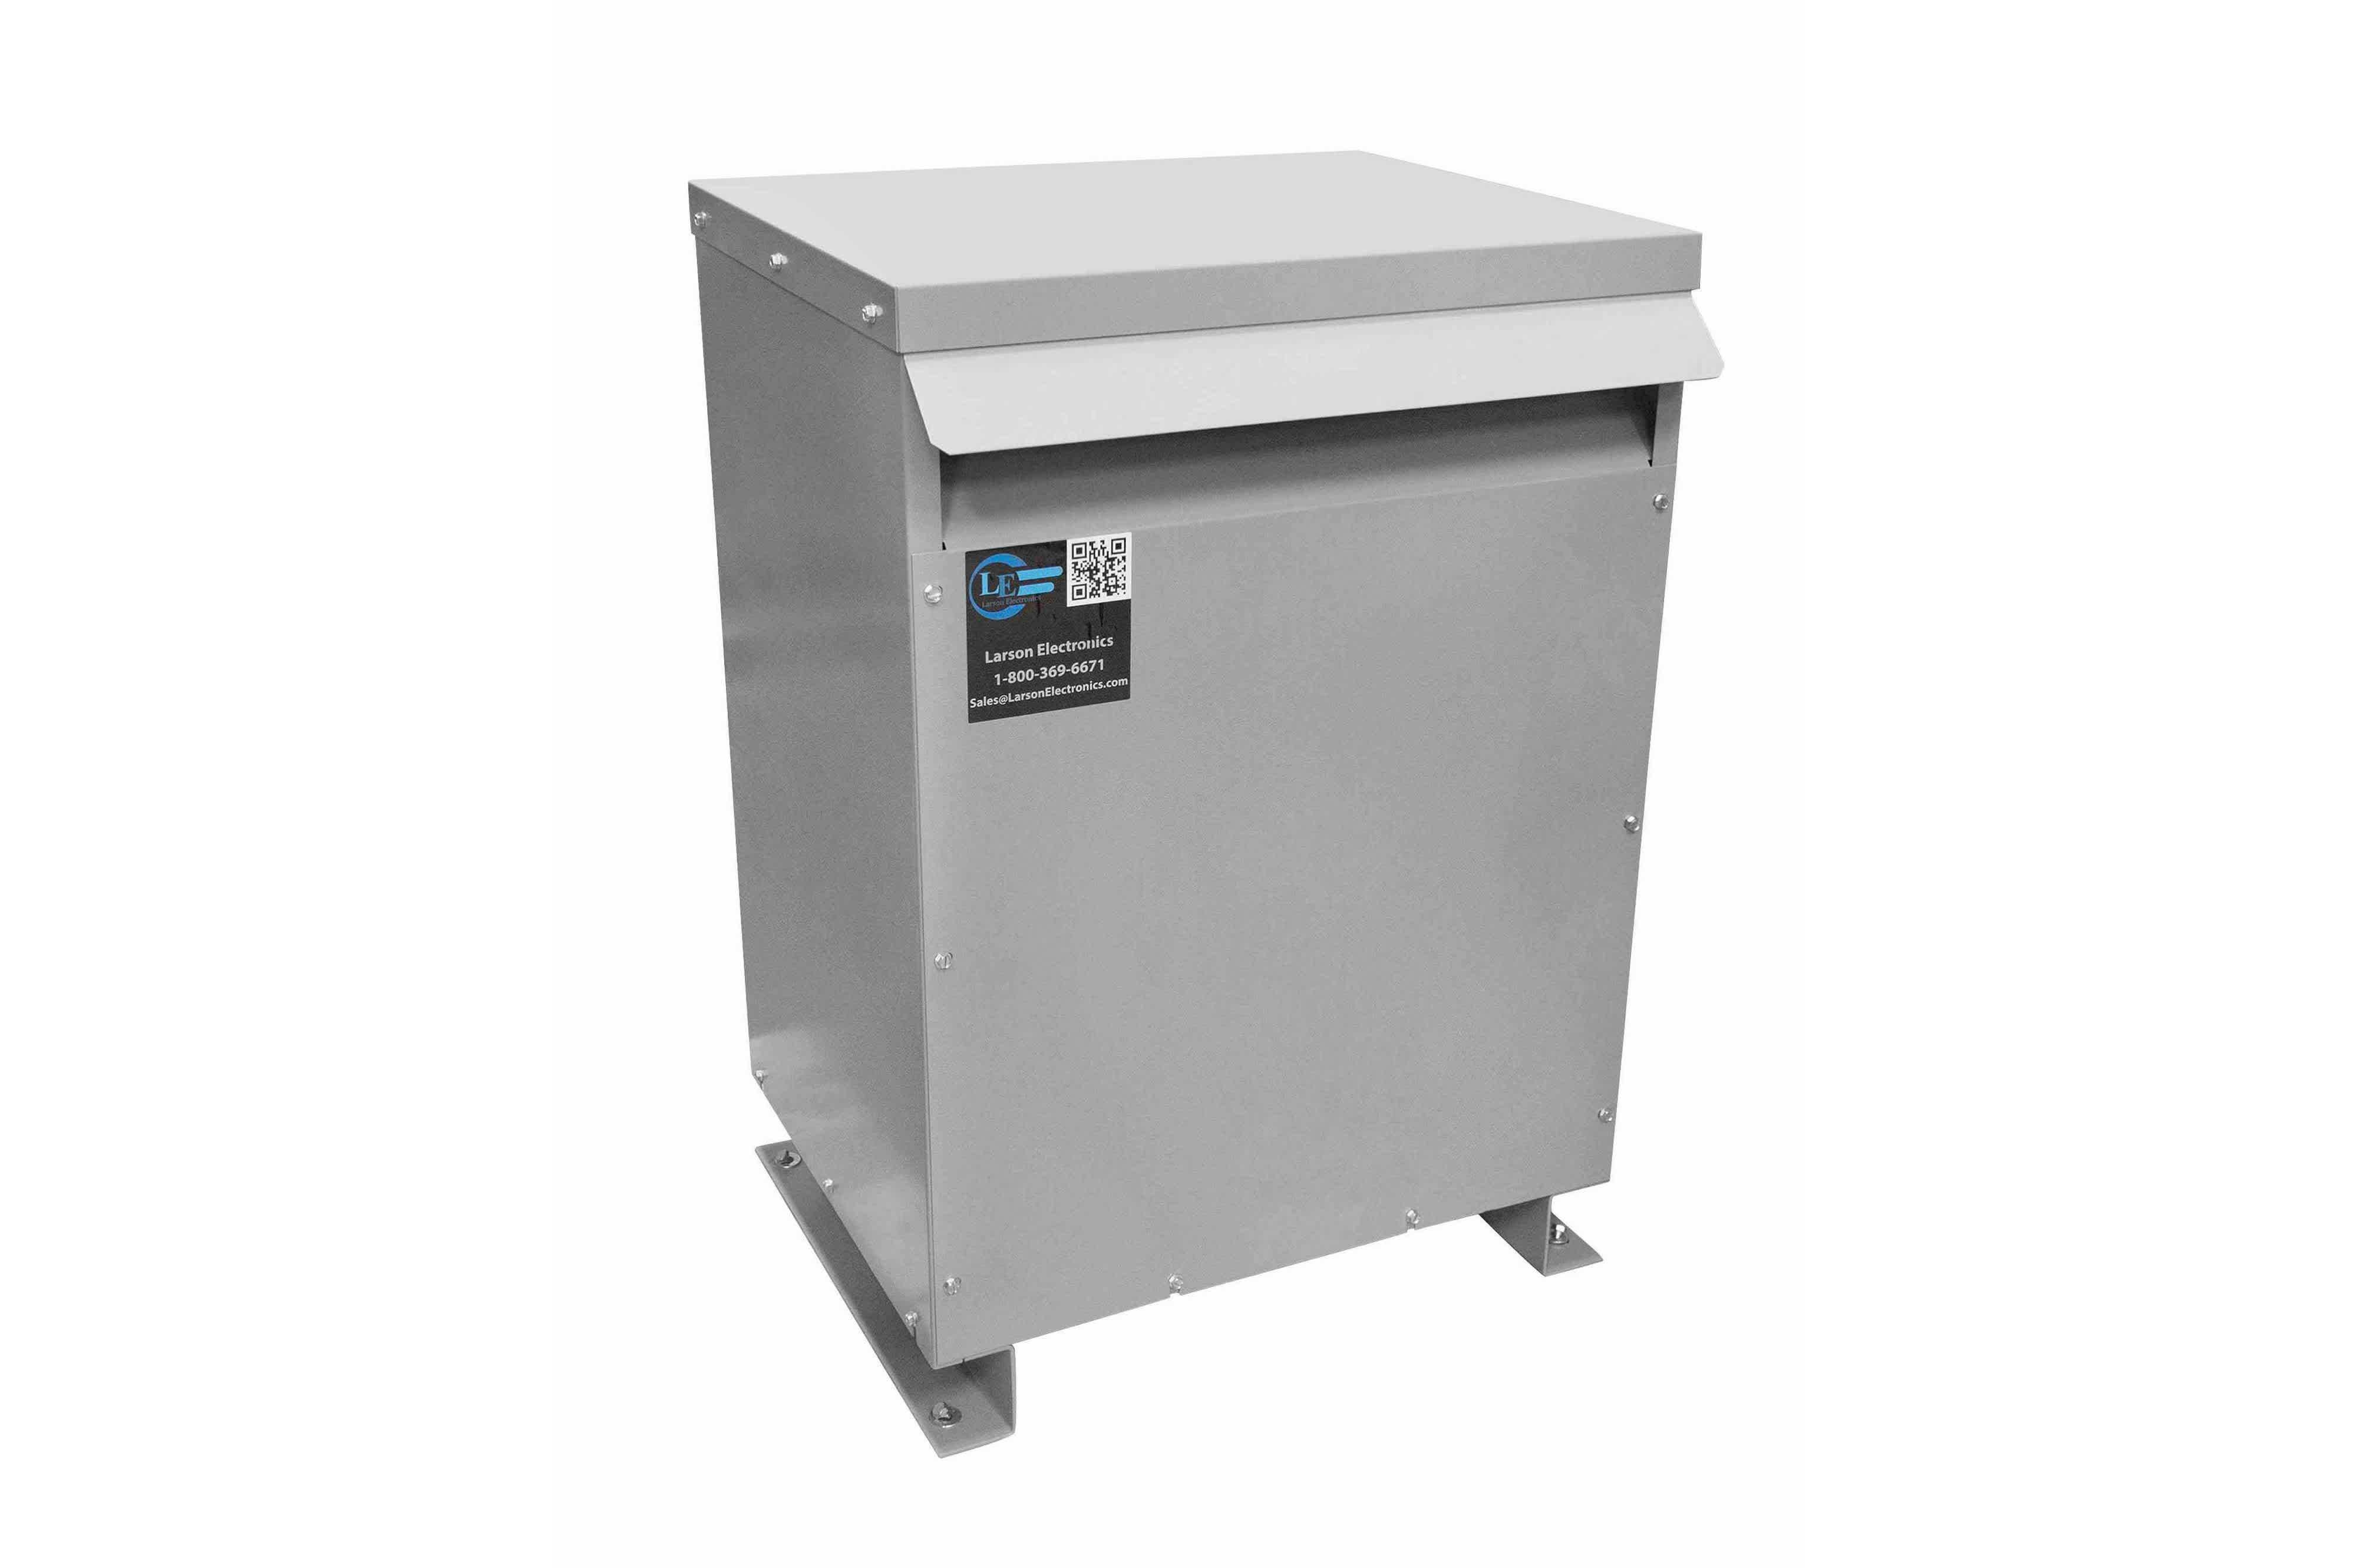 14 kVA 3PH Isolation Transformer, 208V Wye Primary, 240V/120 Delta Secondary, N3R, Ventilated, 60 Hz